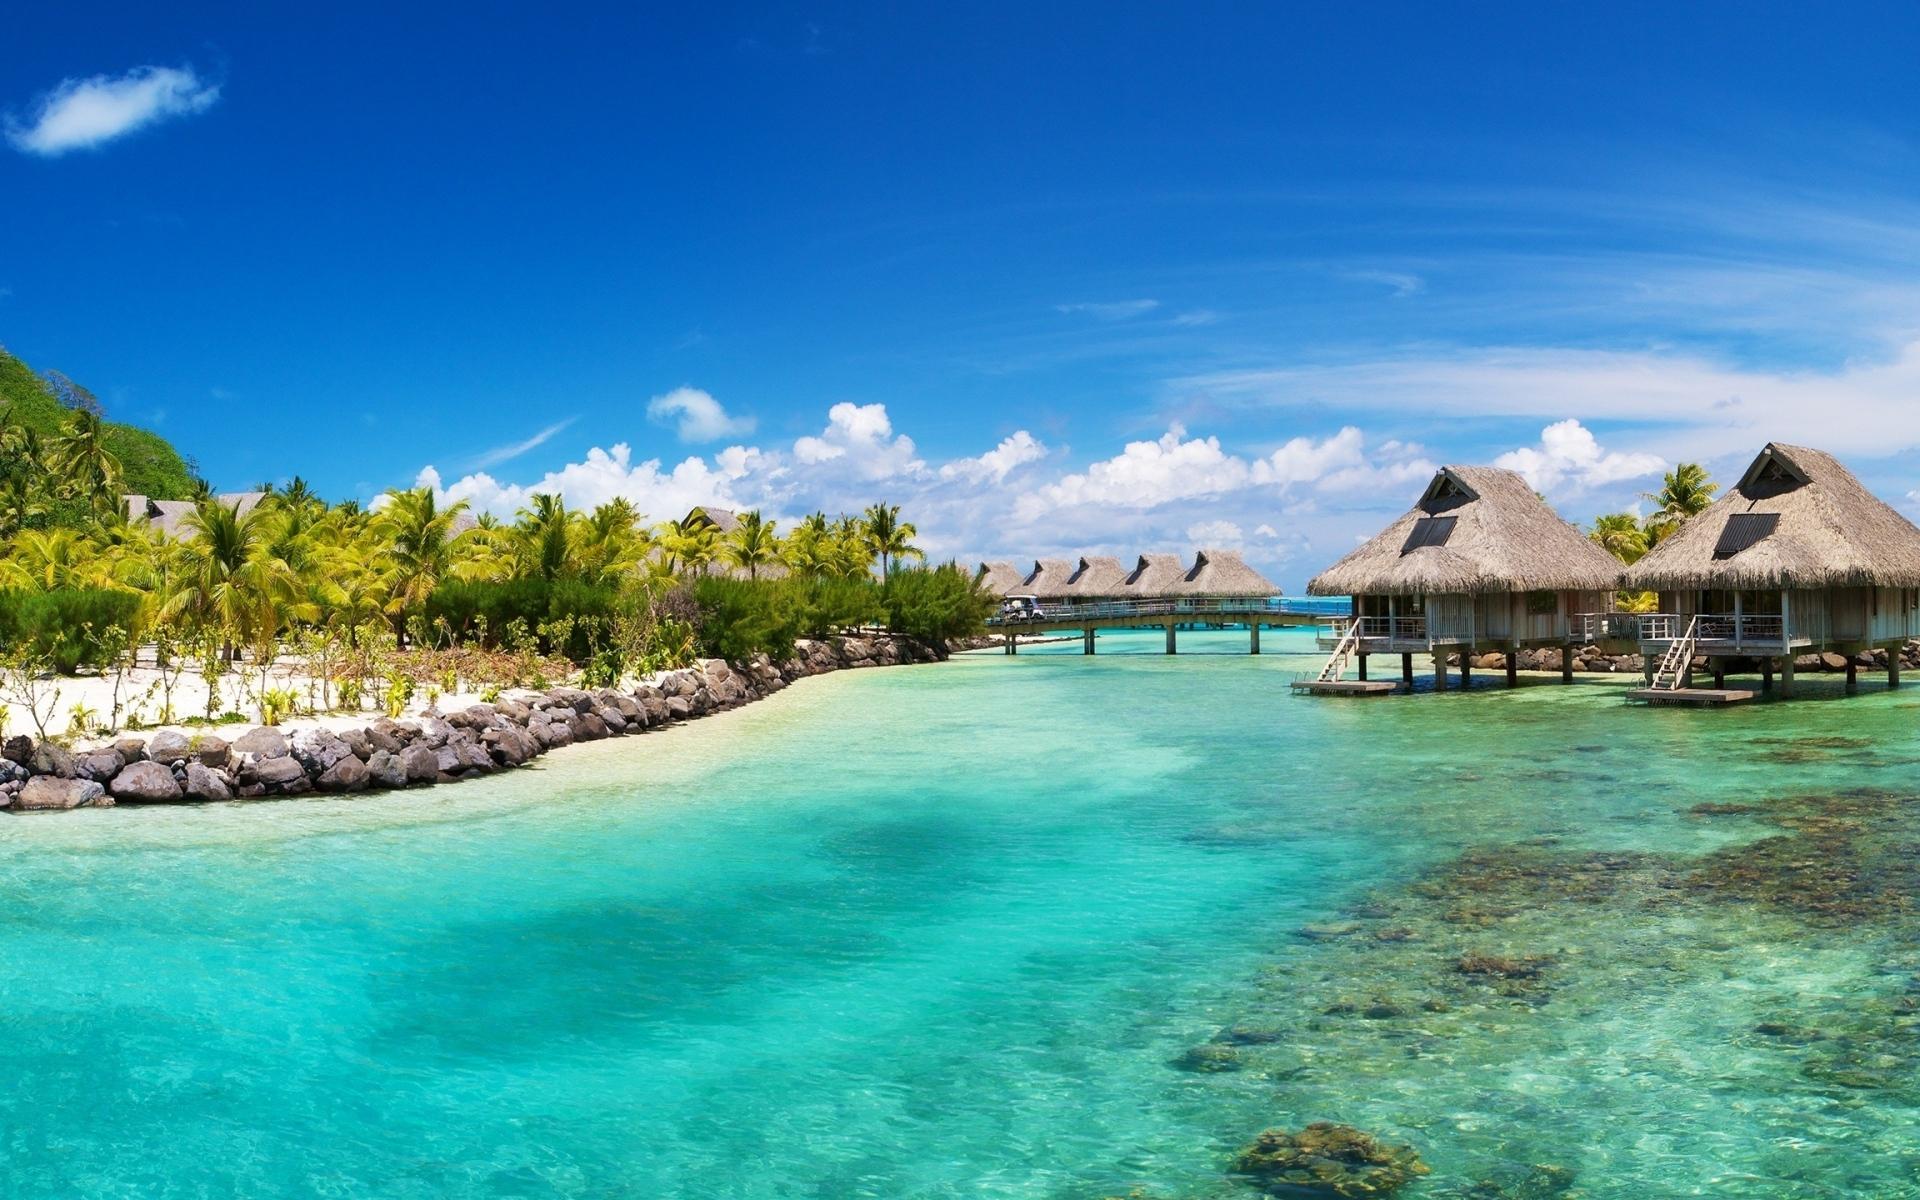 oke 16 - Tempat Wisata Terindah di Indonesia, Wajib Kamu Kunjungi!